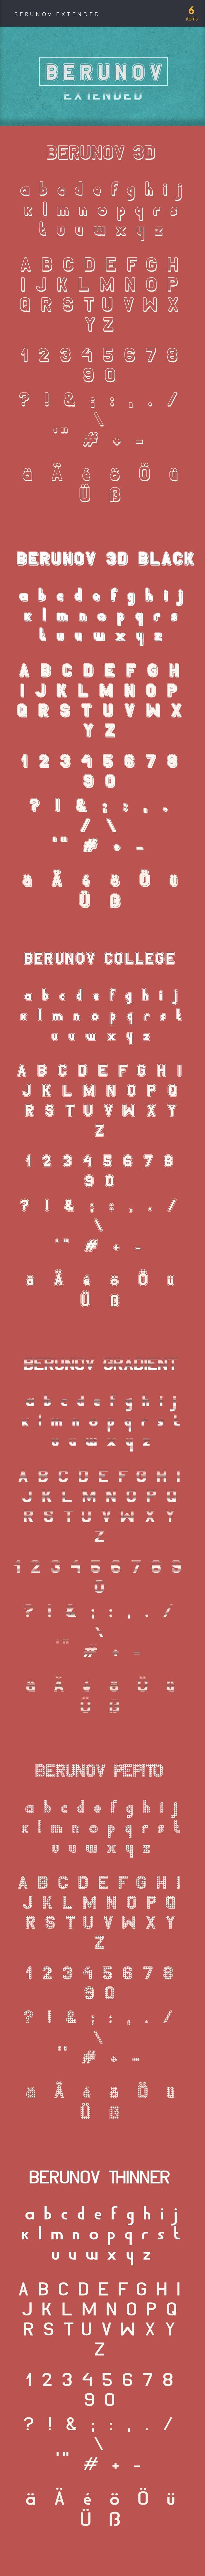 The Best Mega Graphics Bundle. 1000+ Premium Items for $49 - font berunov extended large2